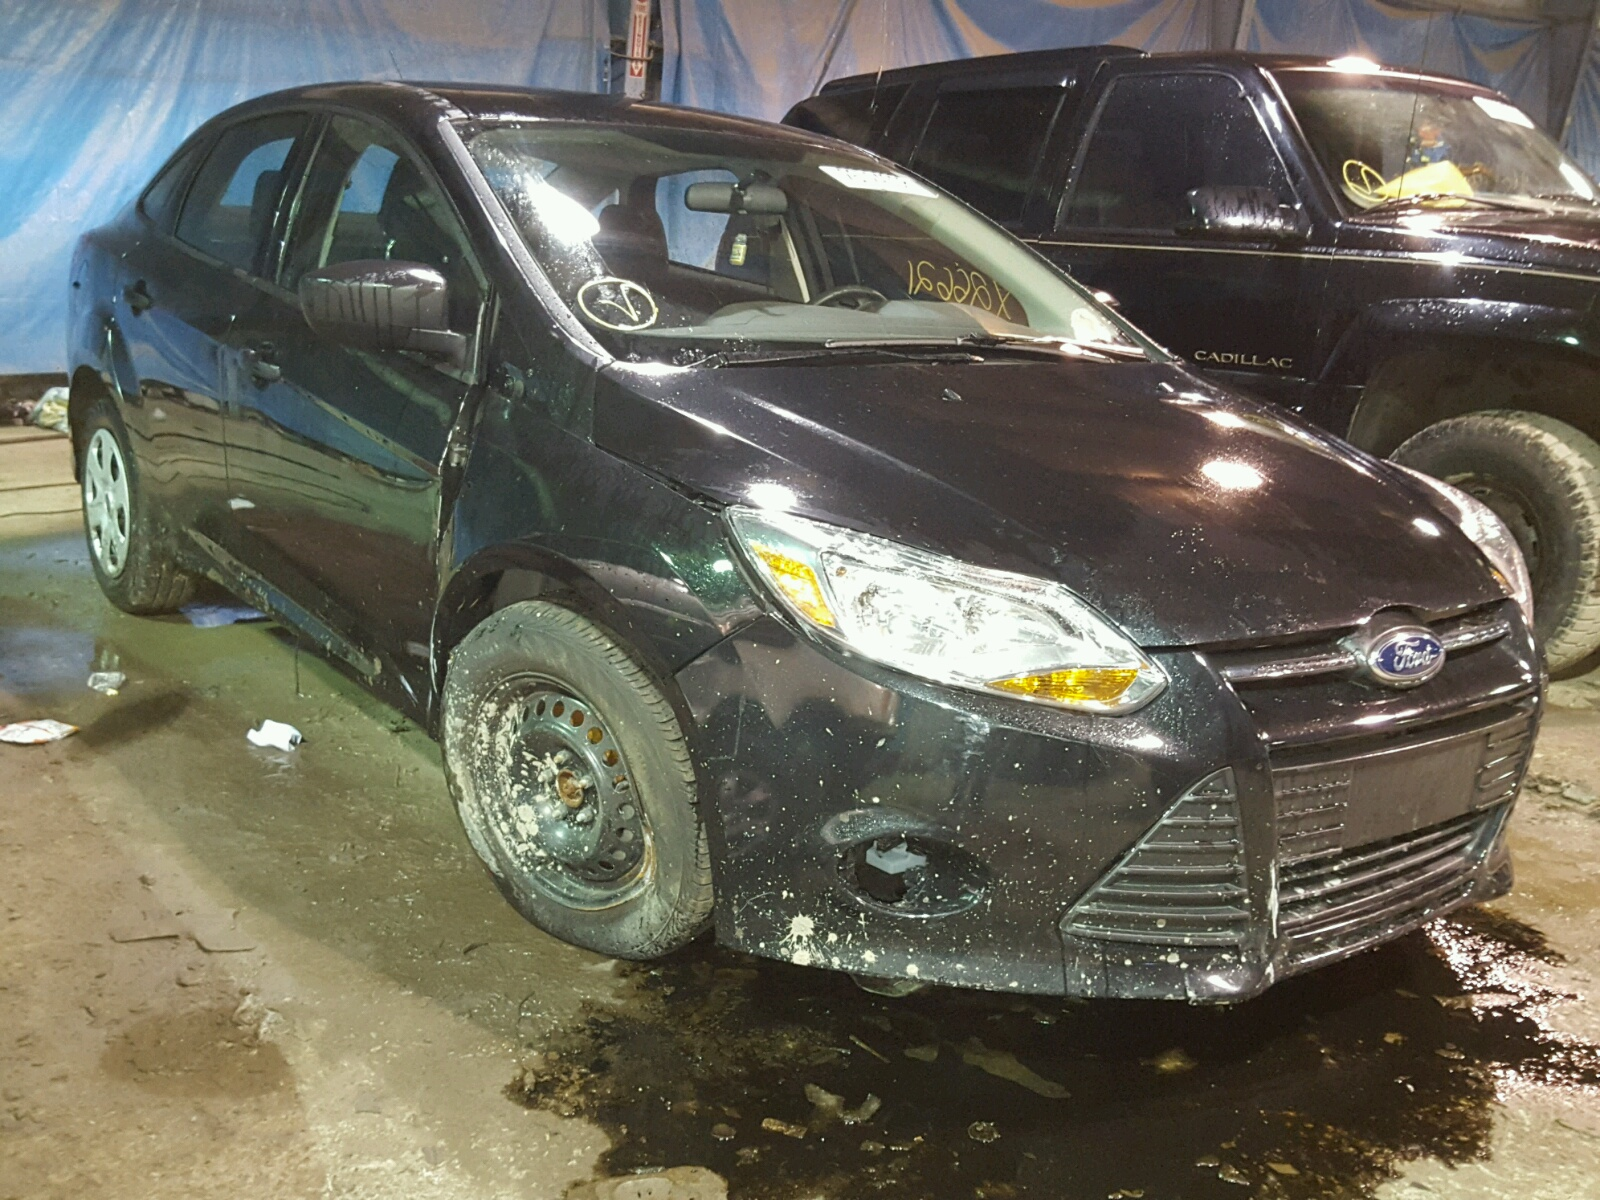 1fadp3e29el429805 2014 Black Ford Focus S On Sale In Hammond Lights 20l Left View